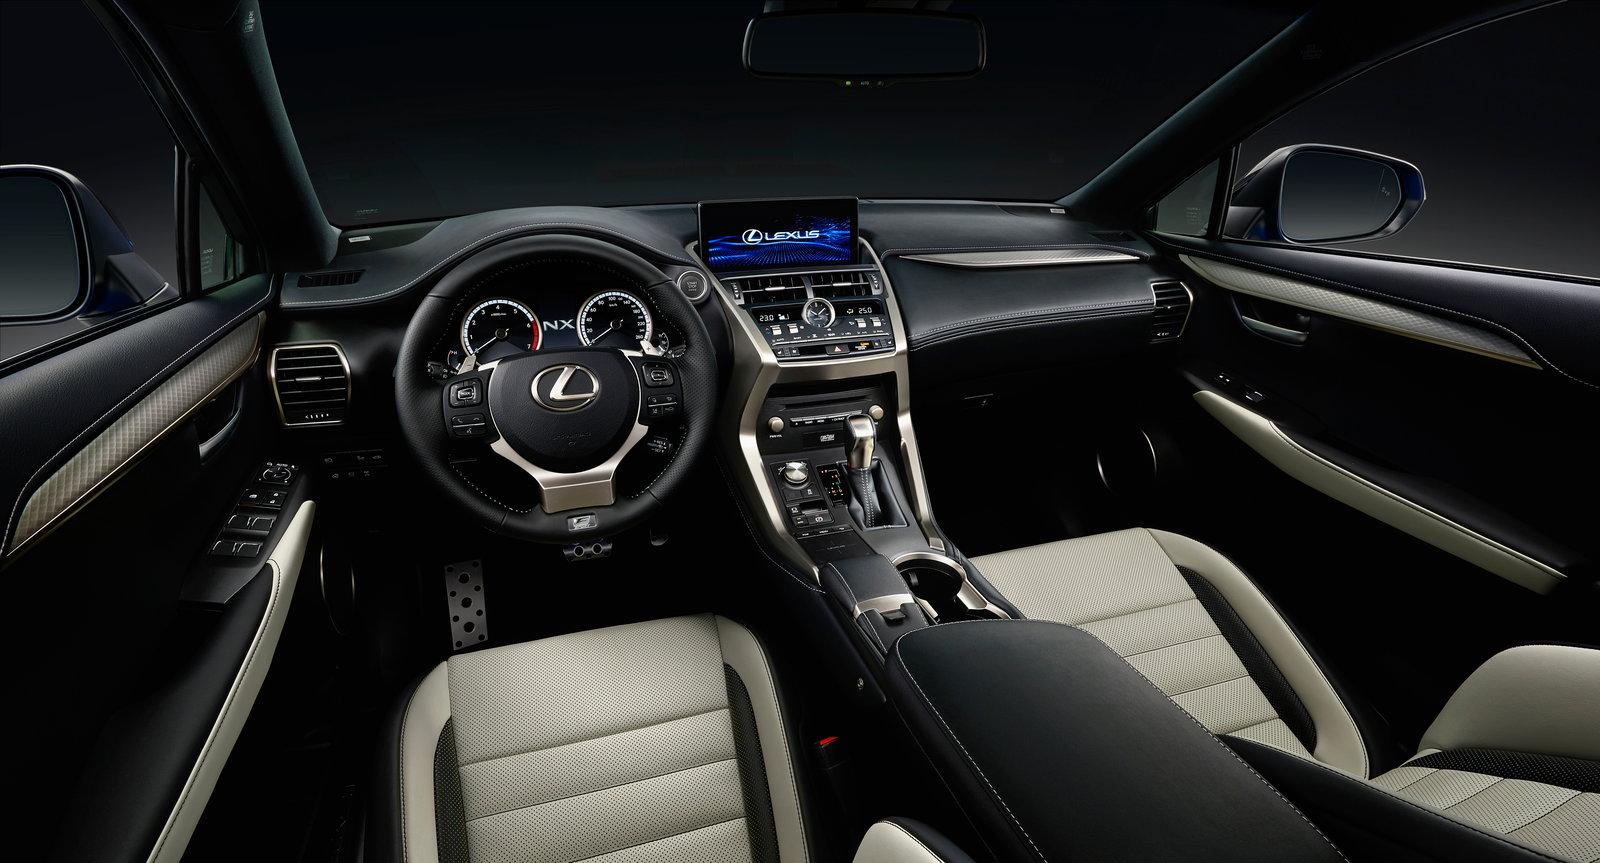 2018 Lexus NX 300h Deals, Prices, Incentives & Leases ...